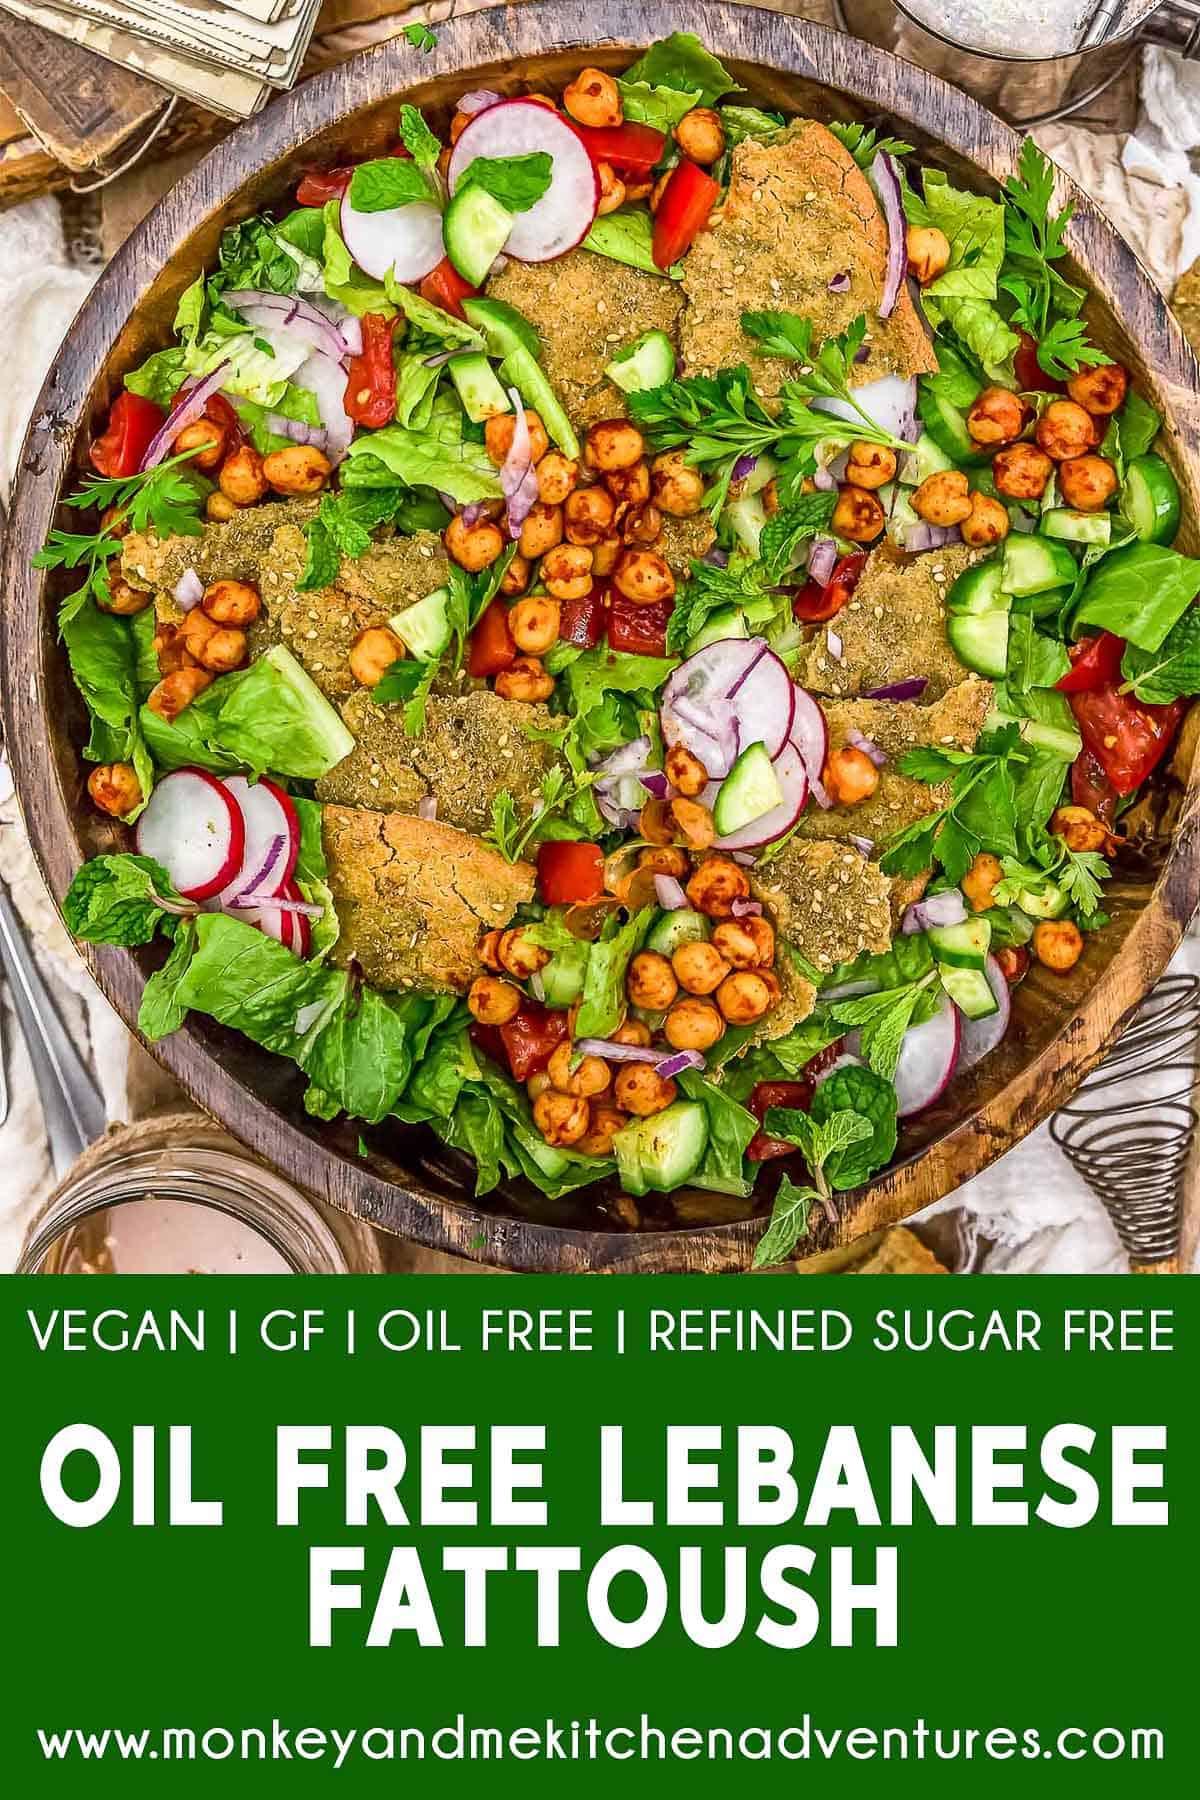 Oil Free Lebanese Fattoush with text description